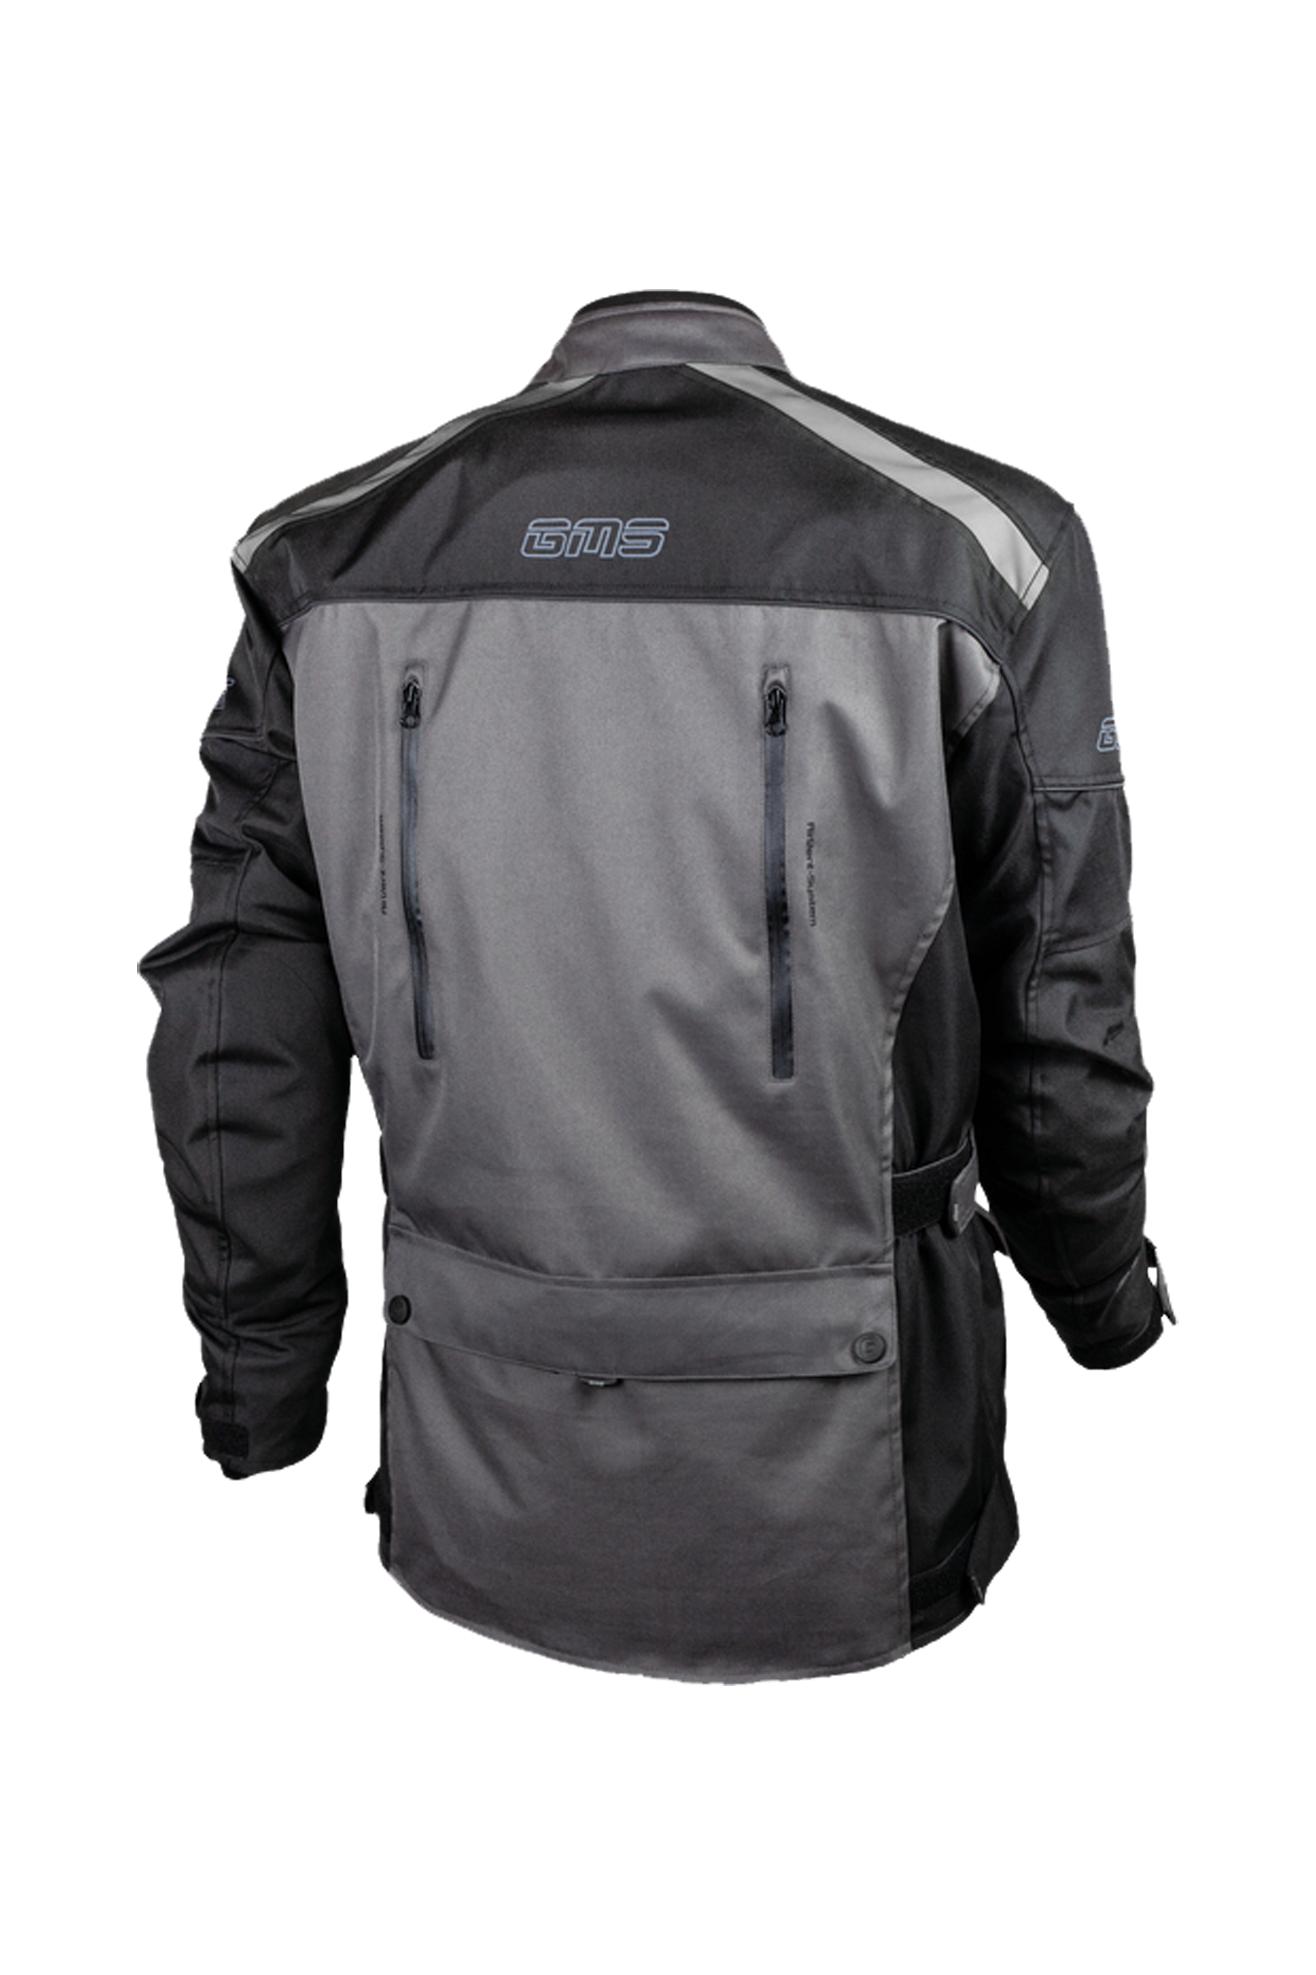 gms giacca moto  temper grigia